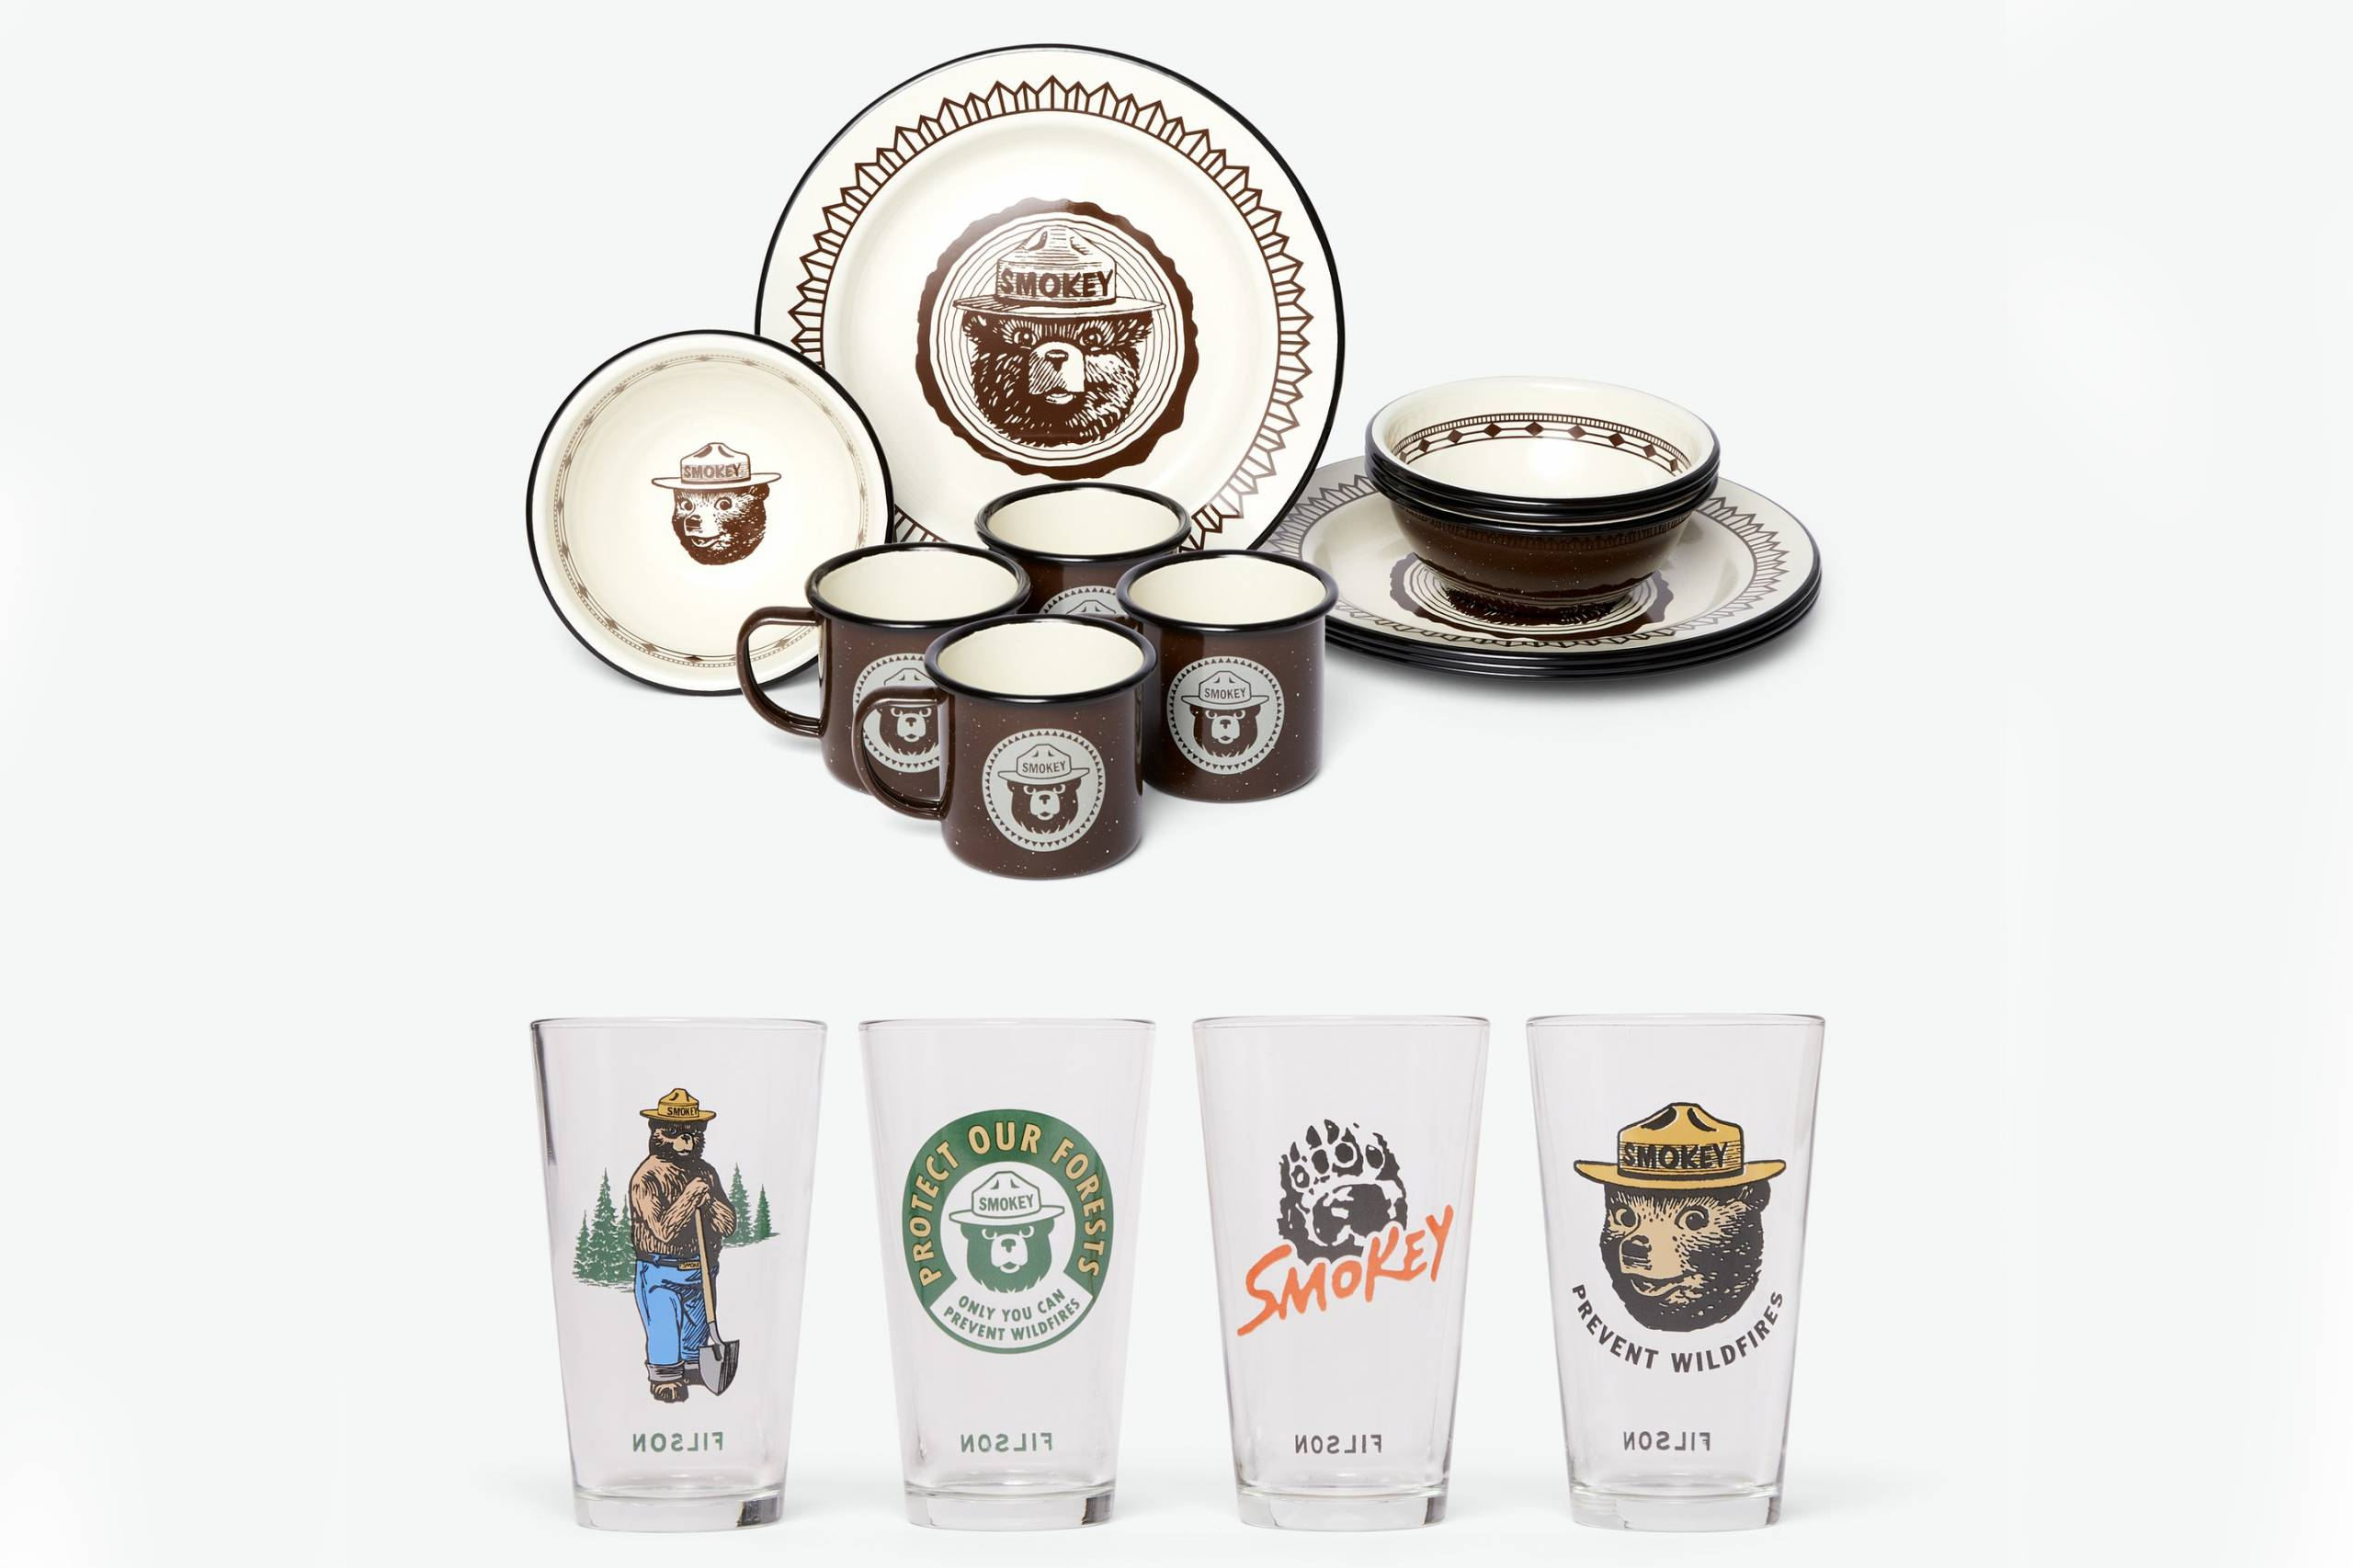 Filson x Smokey the Bear glassware